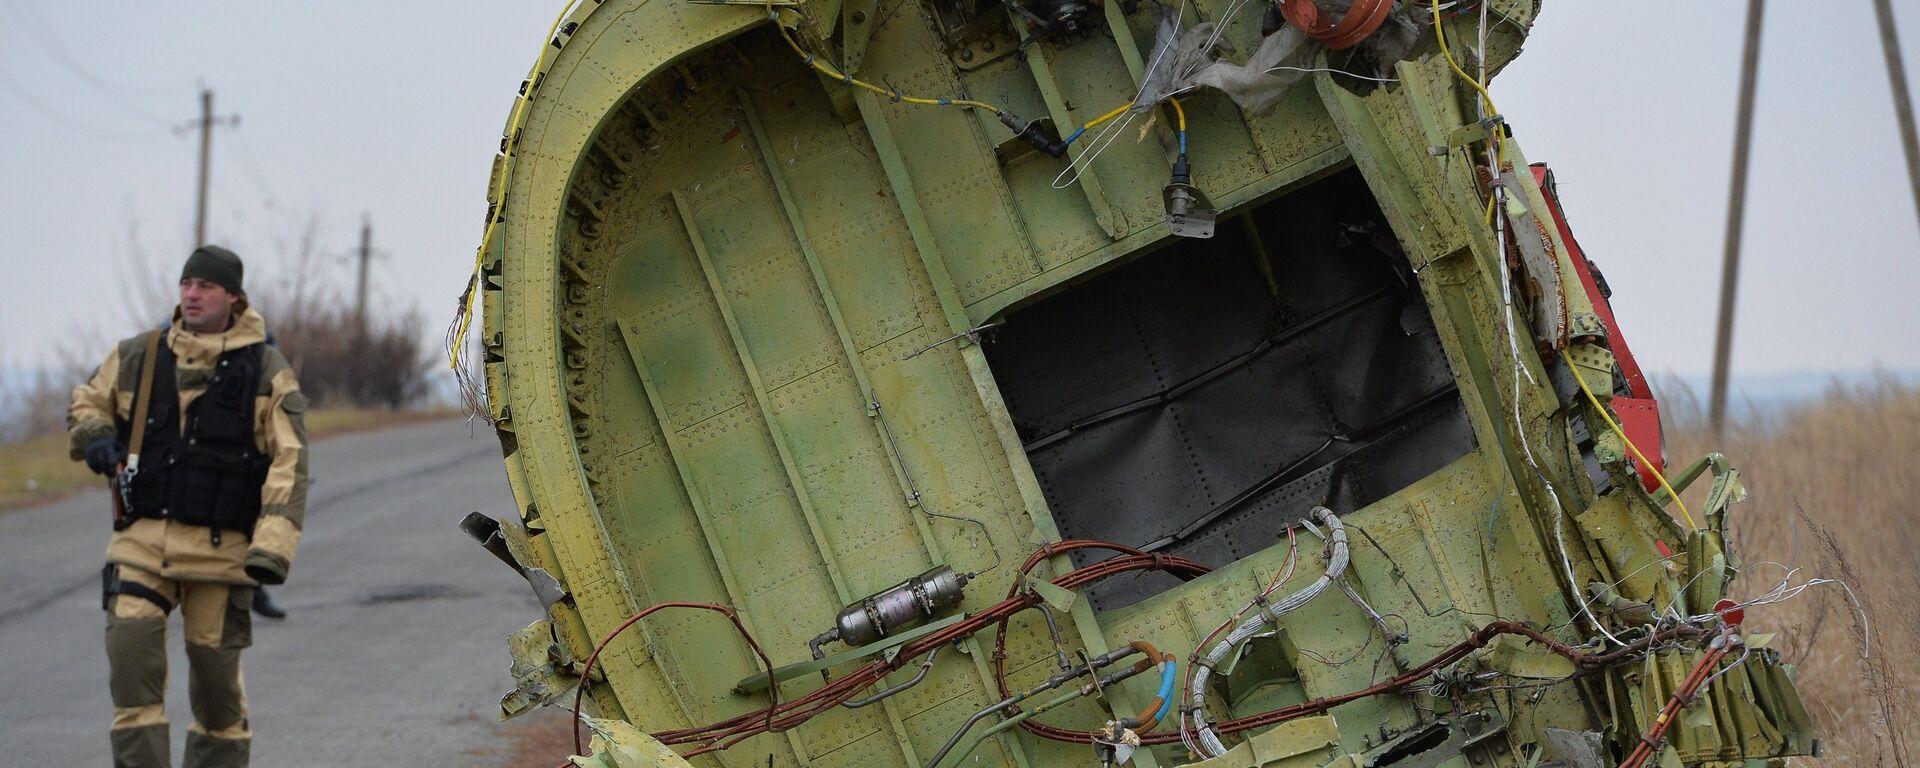 Dutch experts work at Malaysia Airlines Flight MH17 crash site - Sputnik International, 1920, 07.09.2021